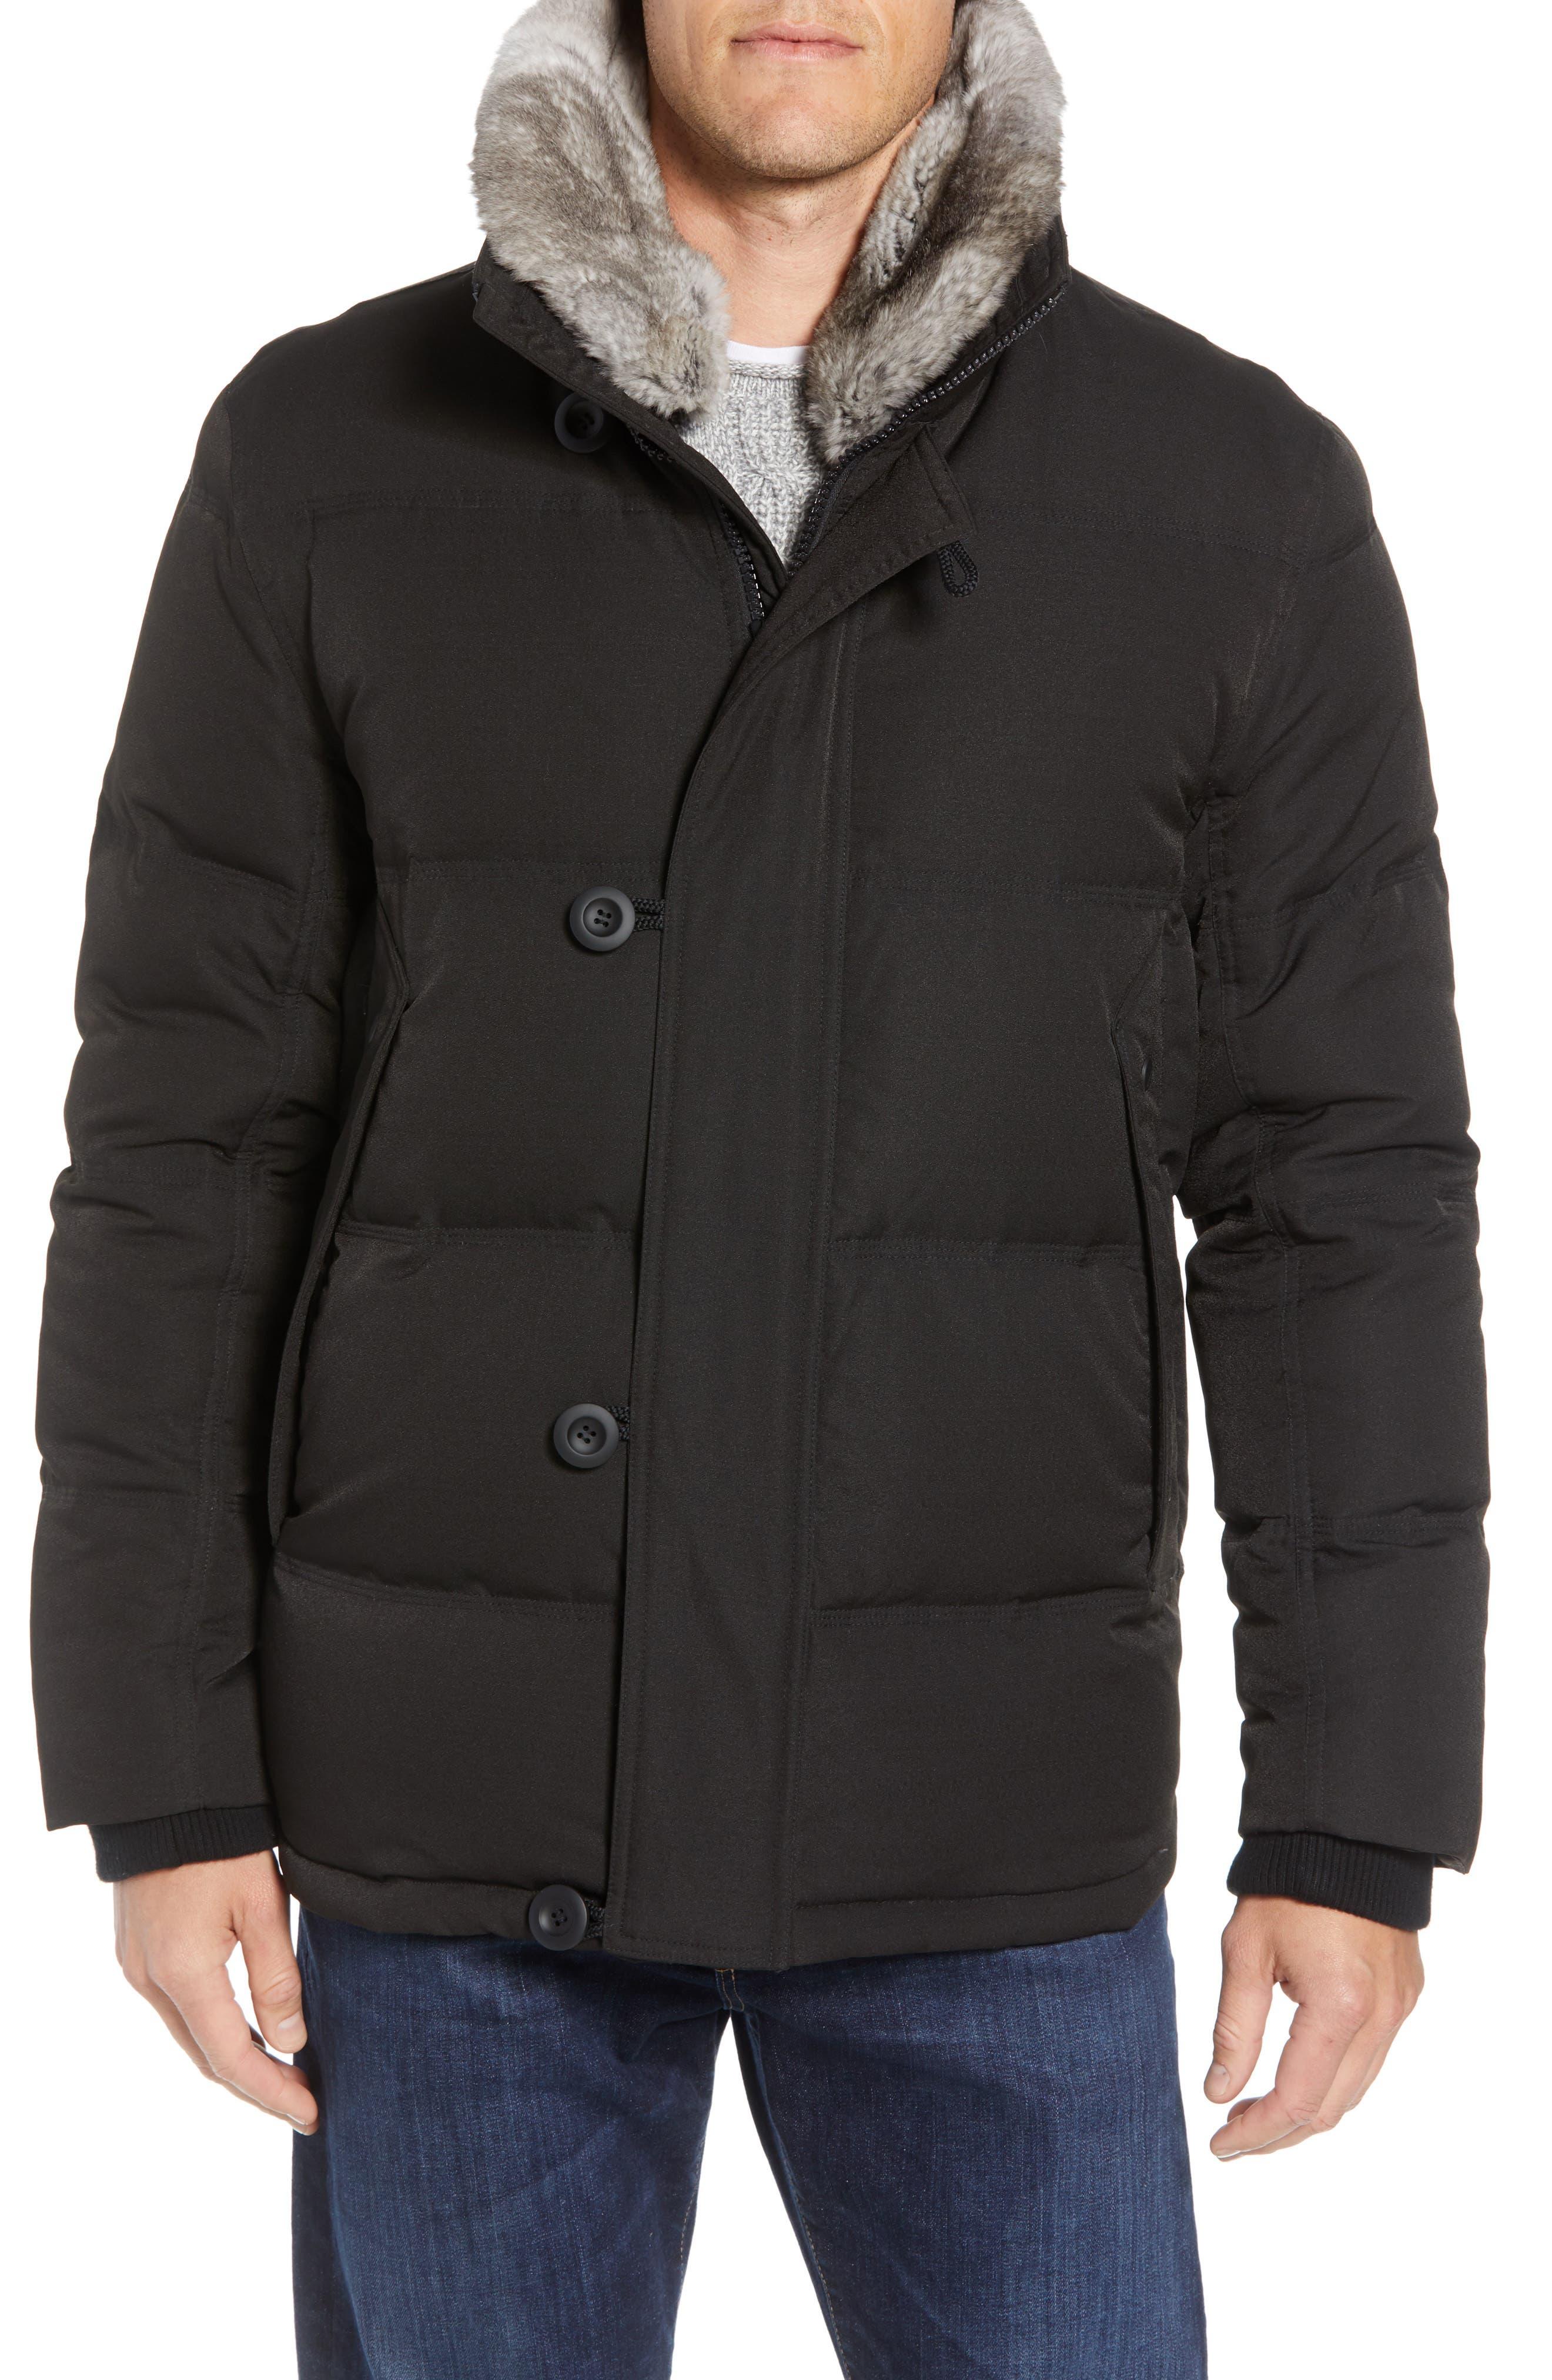 Bryant Genuine Rabbit Fur Trim Down Jacket,                         Main,                         color, BLACK